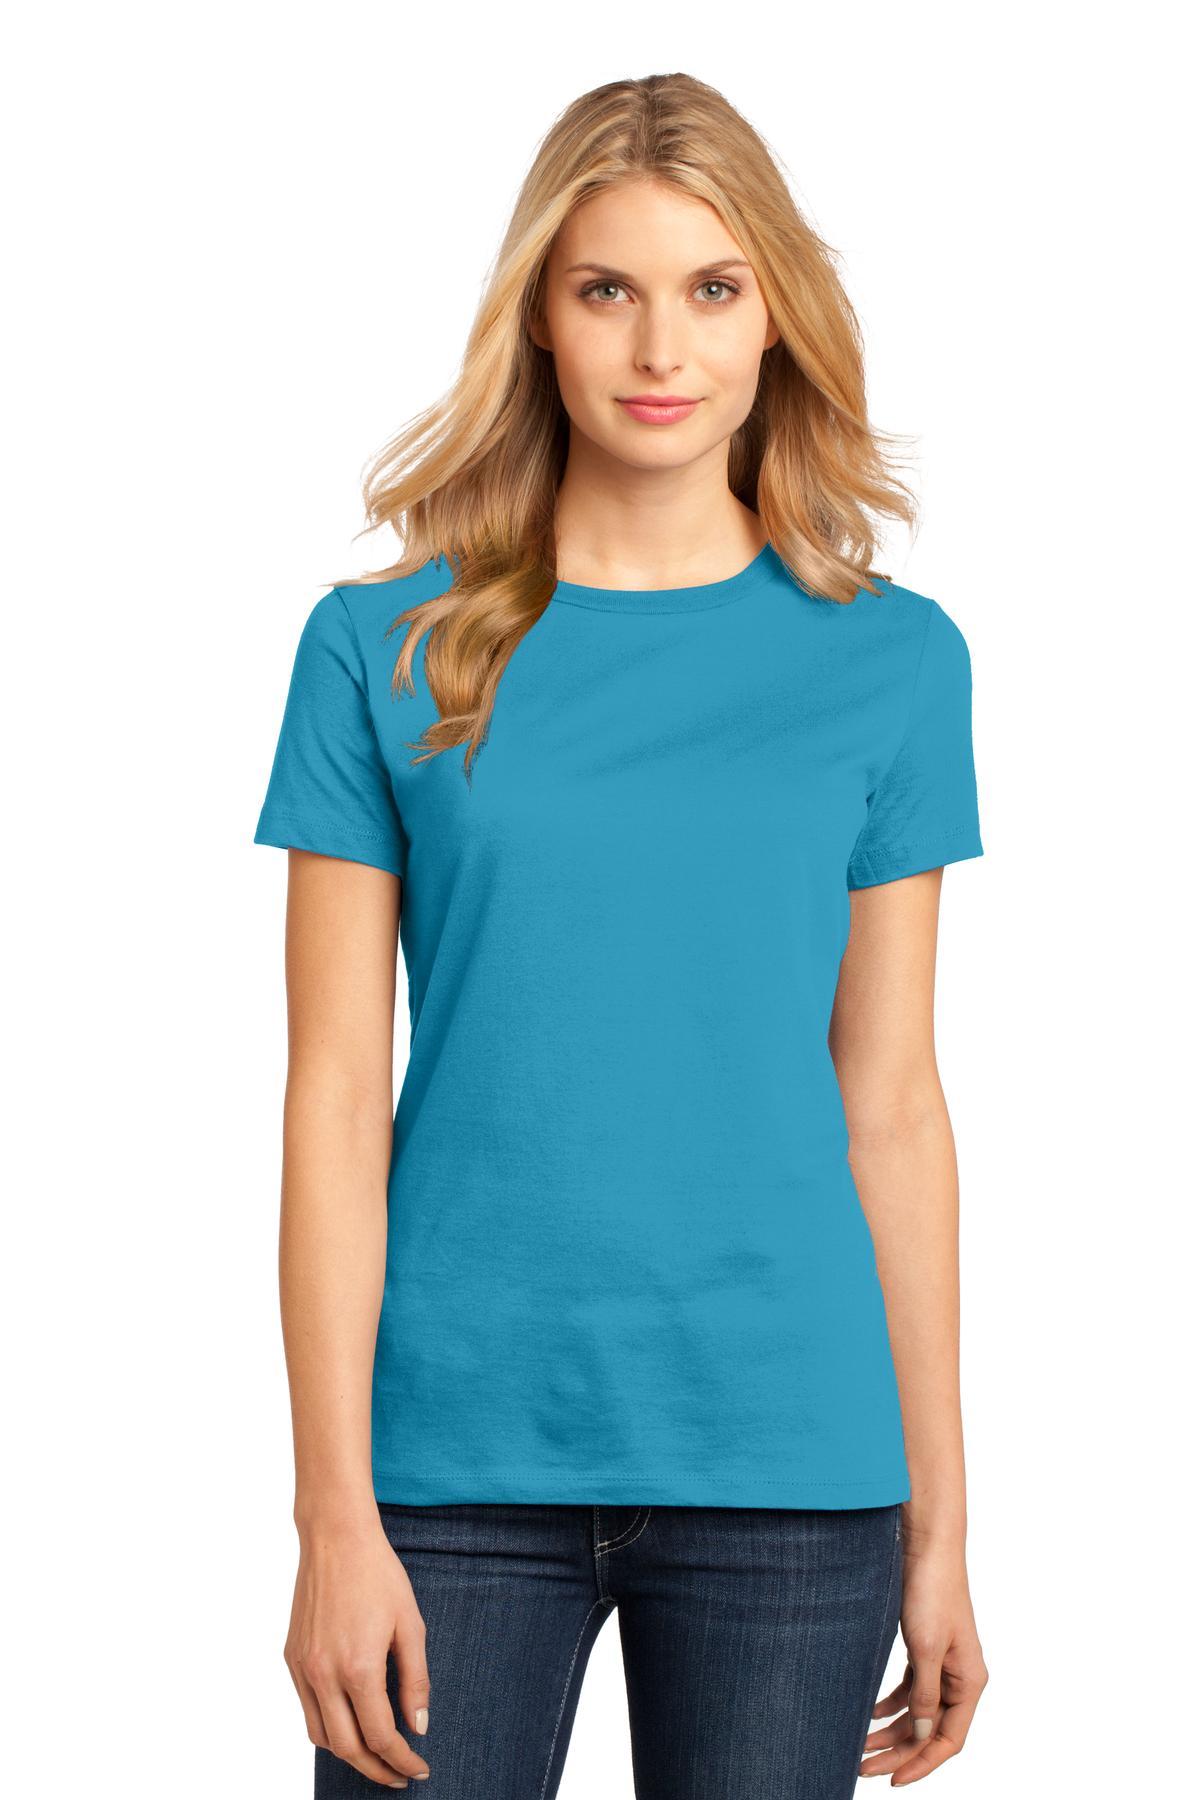 DML brightturquoise model front